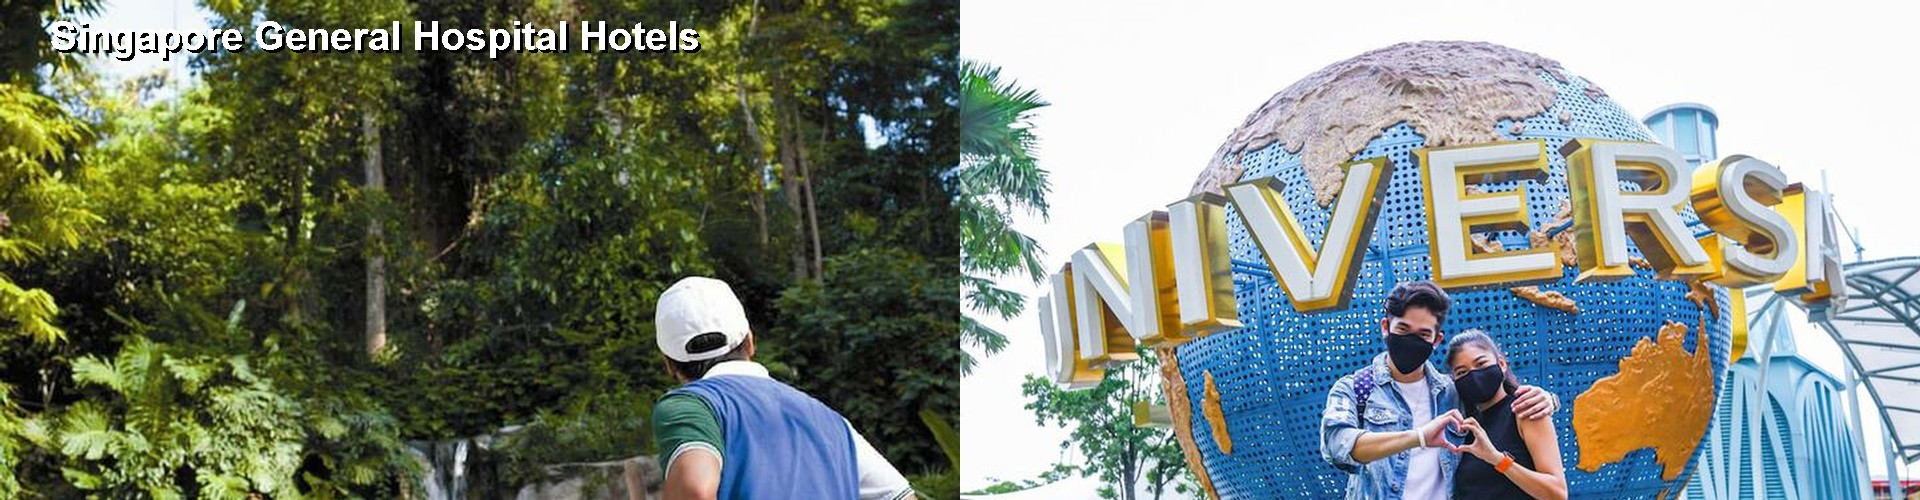 5 Best Hotels Near Singapore General Hospital